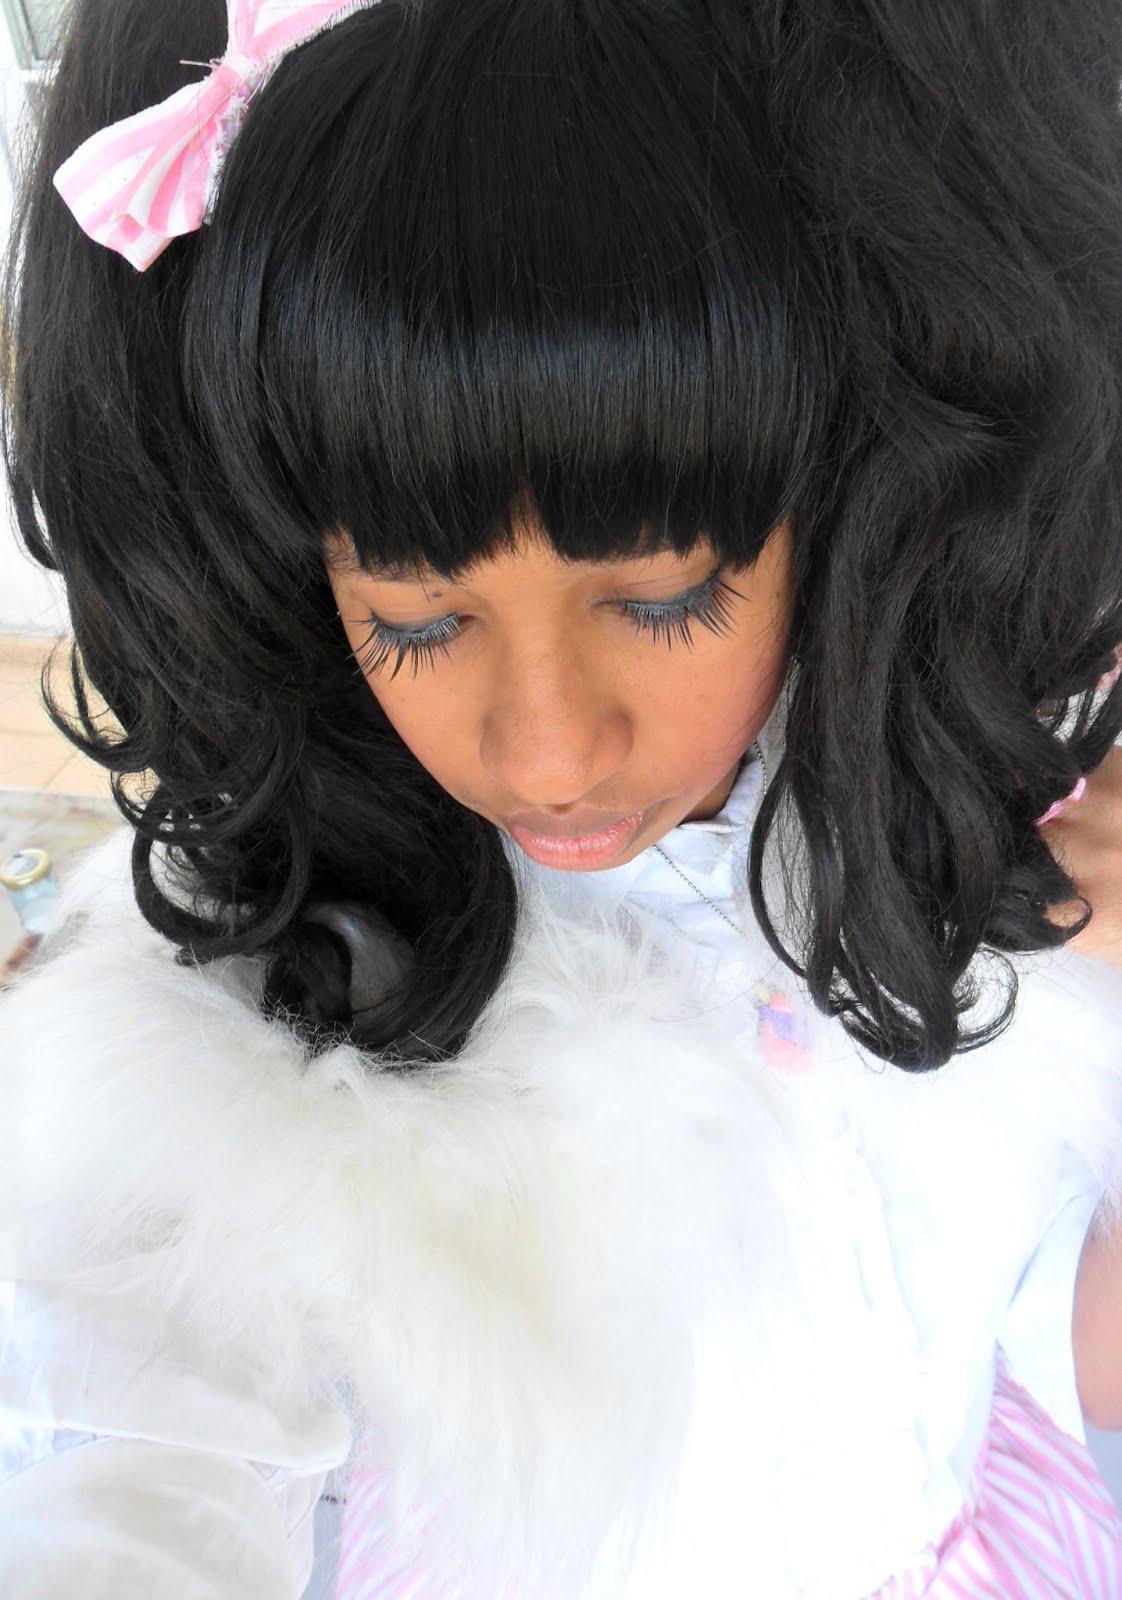 Hime Gyaru Wigs